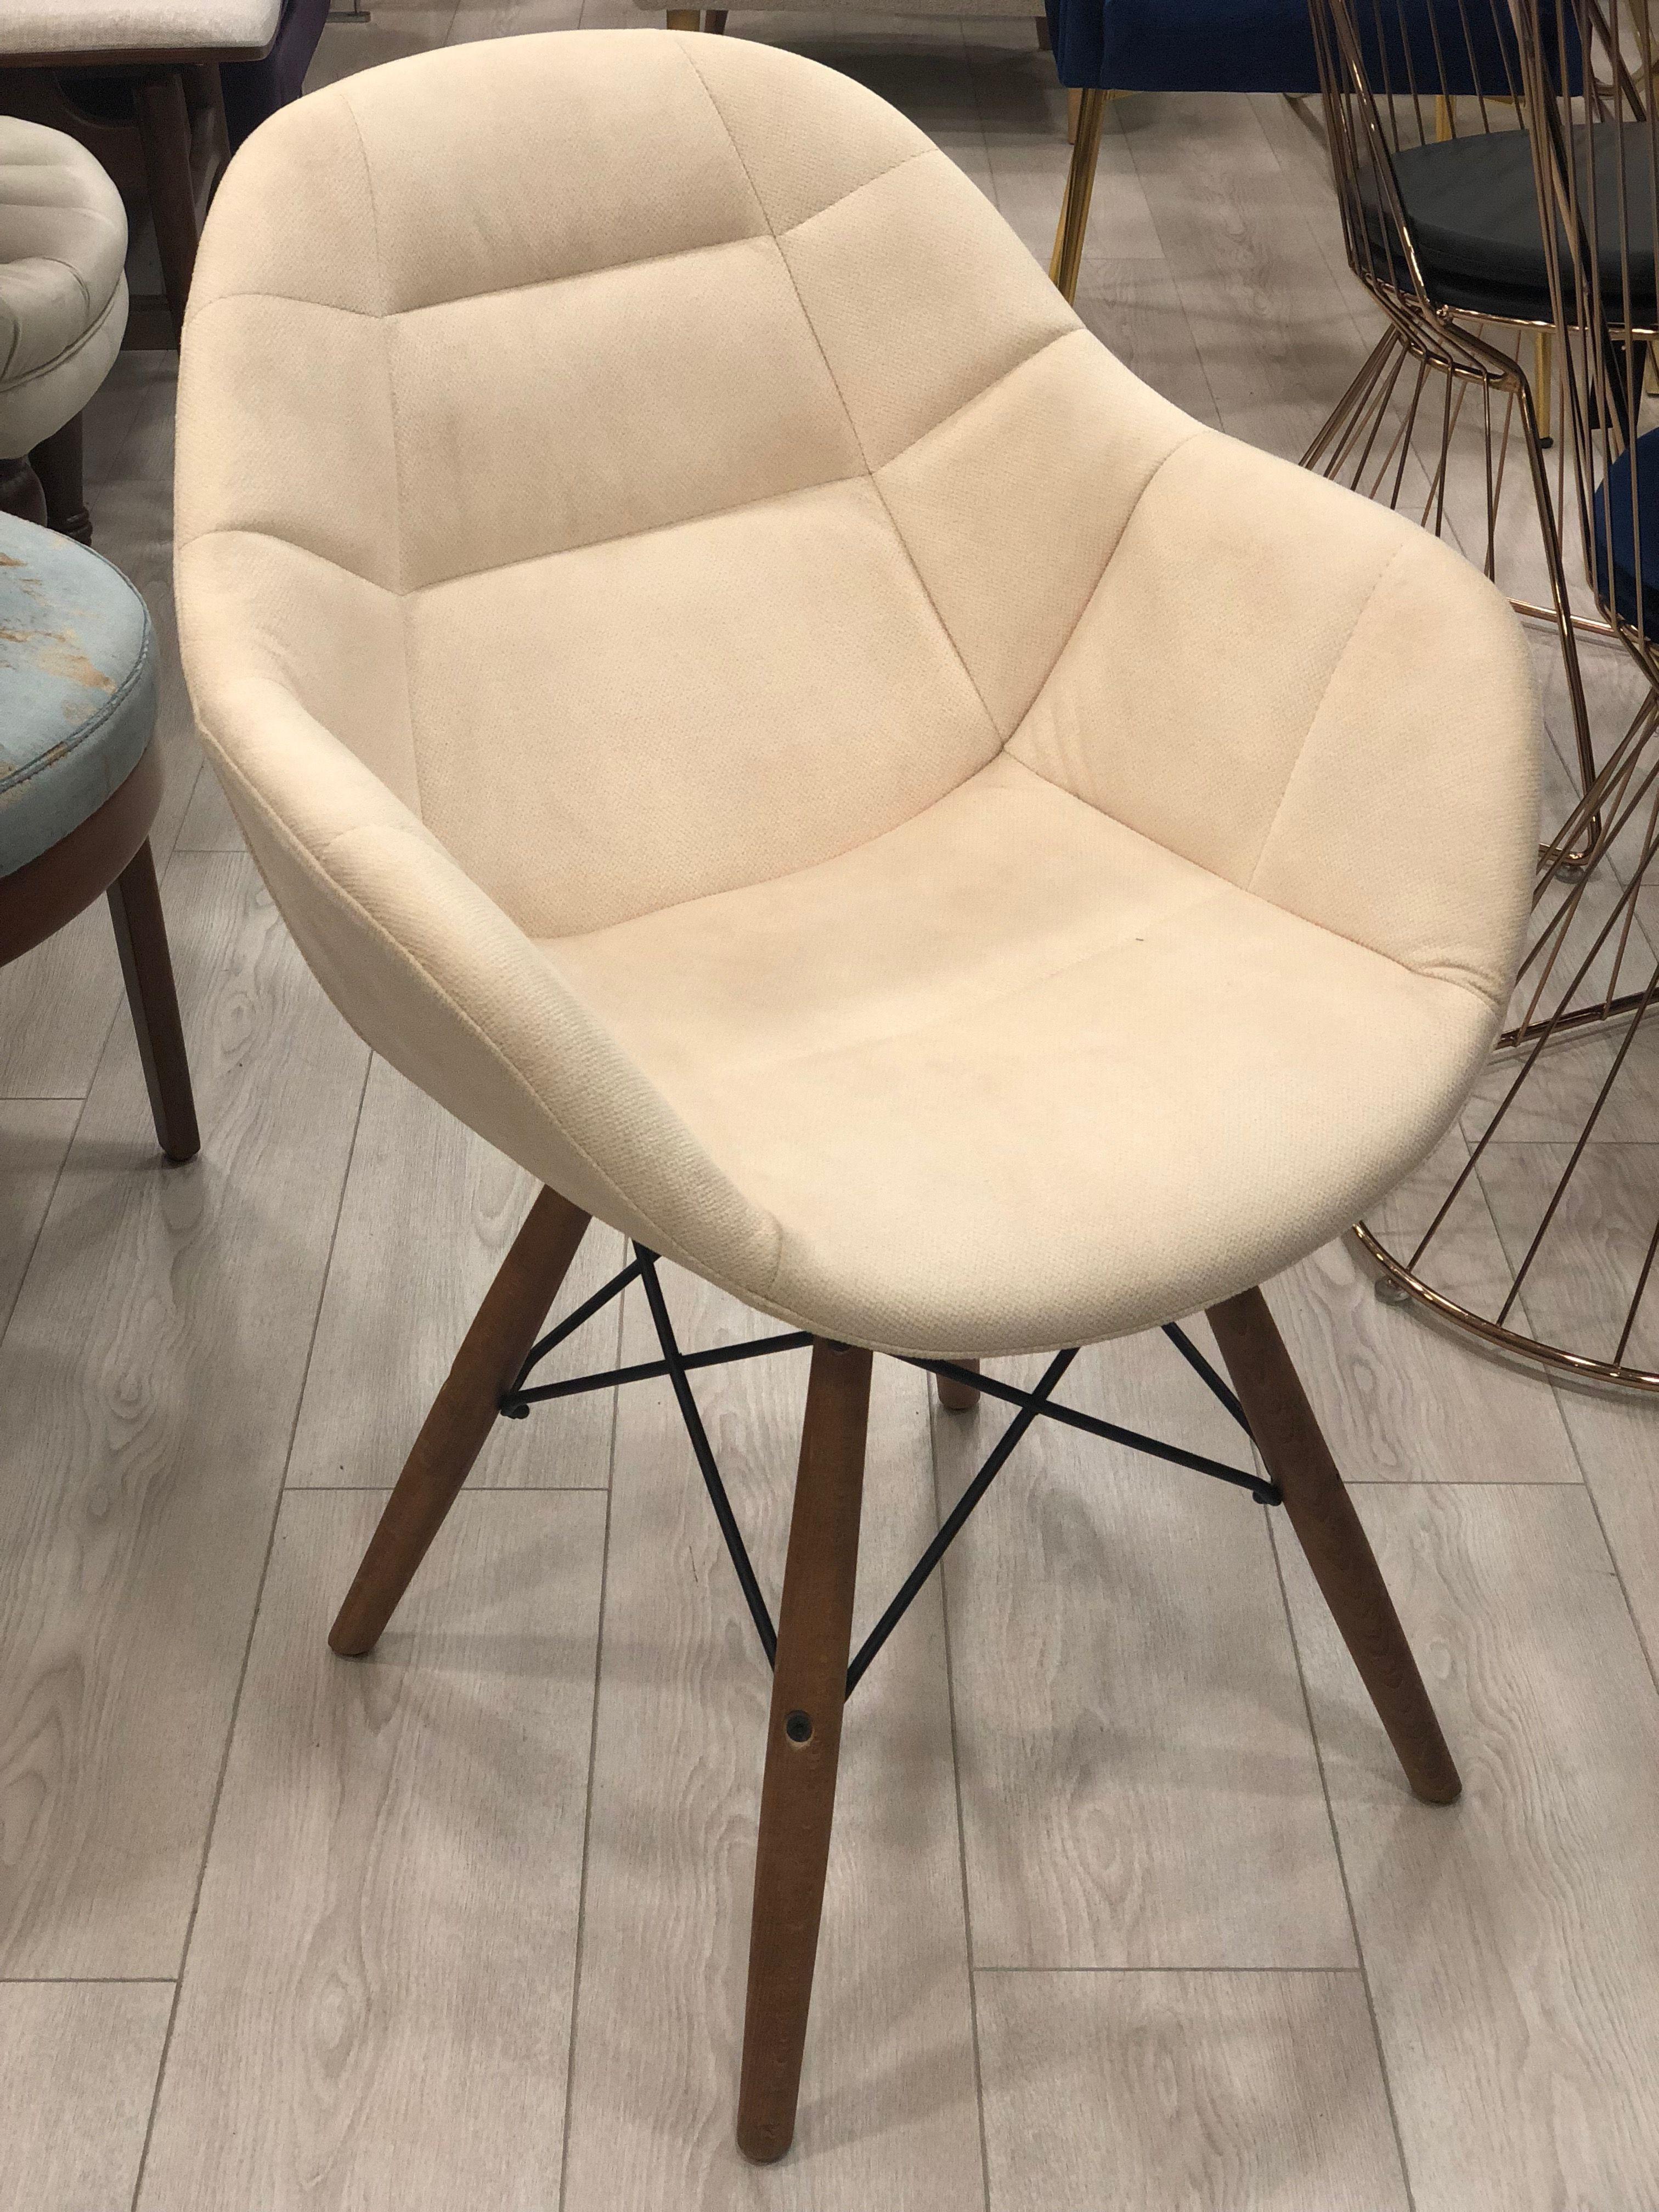 Koltuk Takimlari Outdoor Furniture Sets Eames Lounge Chair Furniture